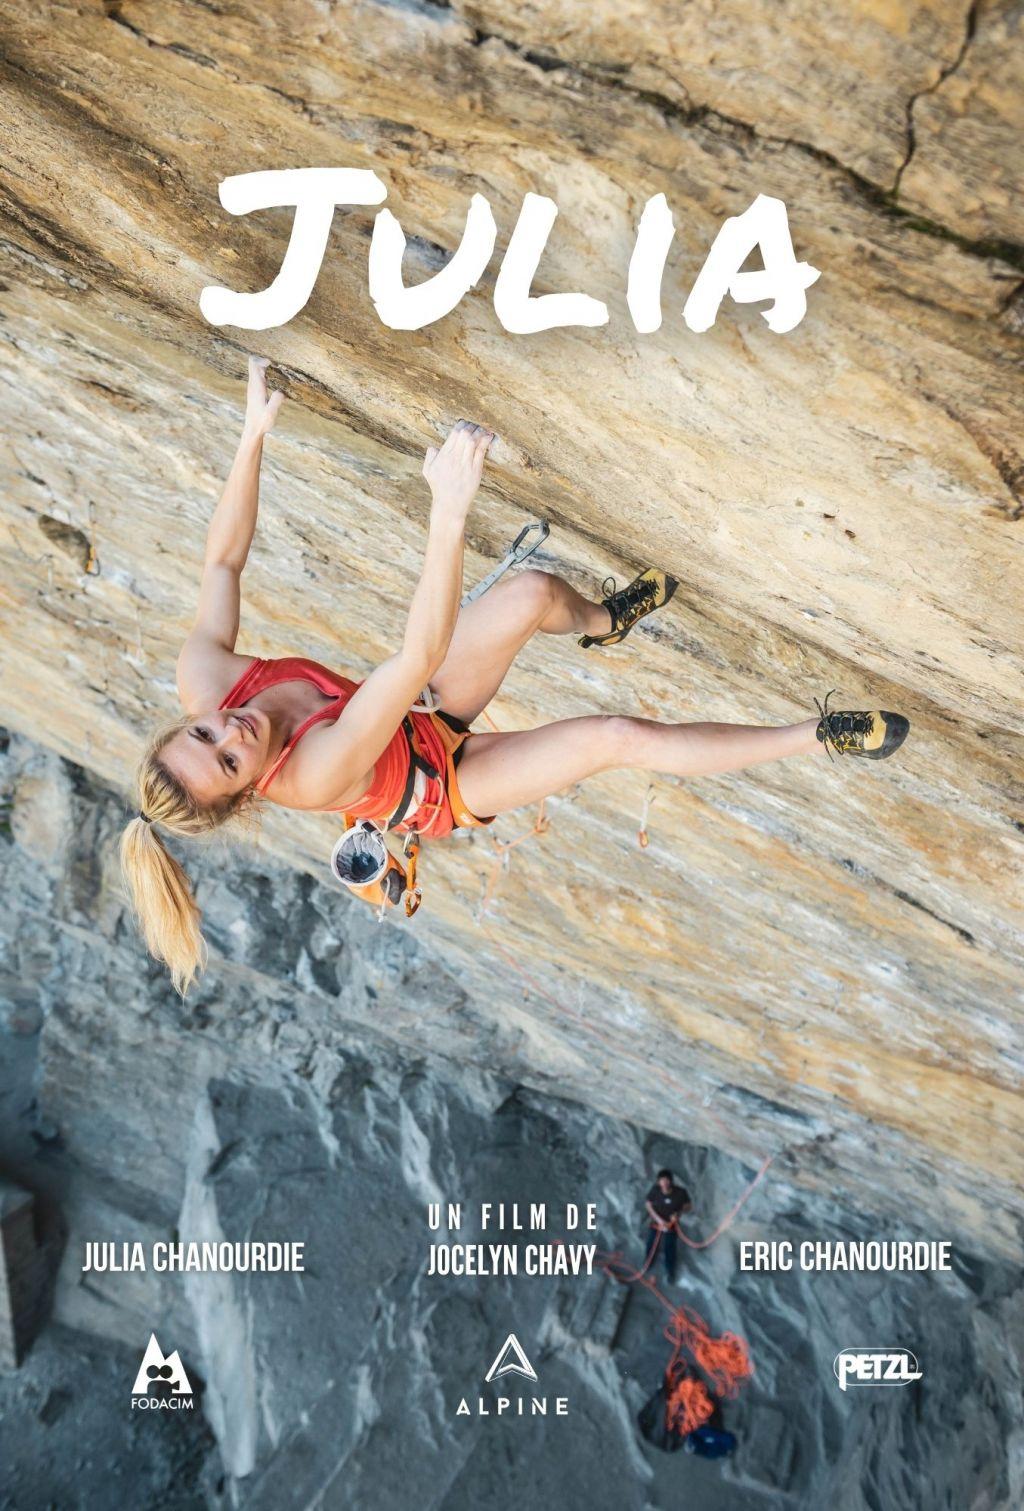 affiche film Julia chanourdie escalade jocelyn chavy festival femmes en montagne